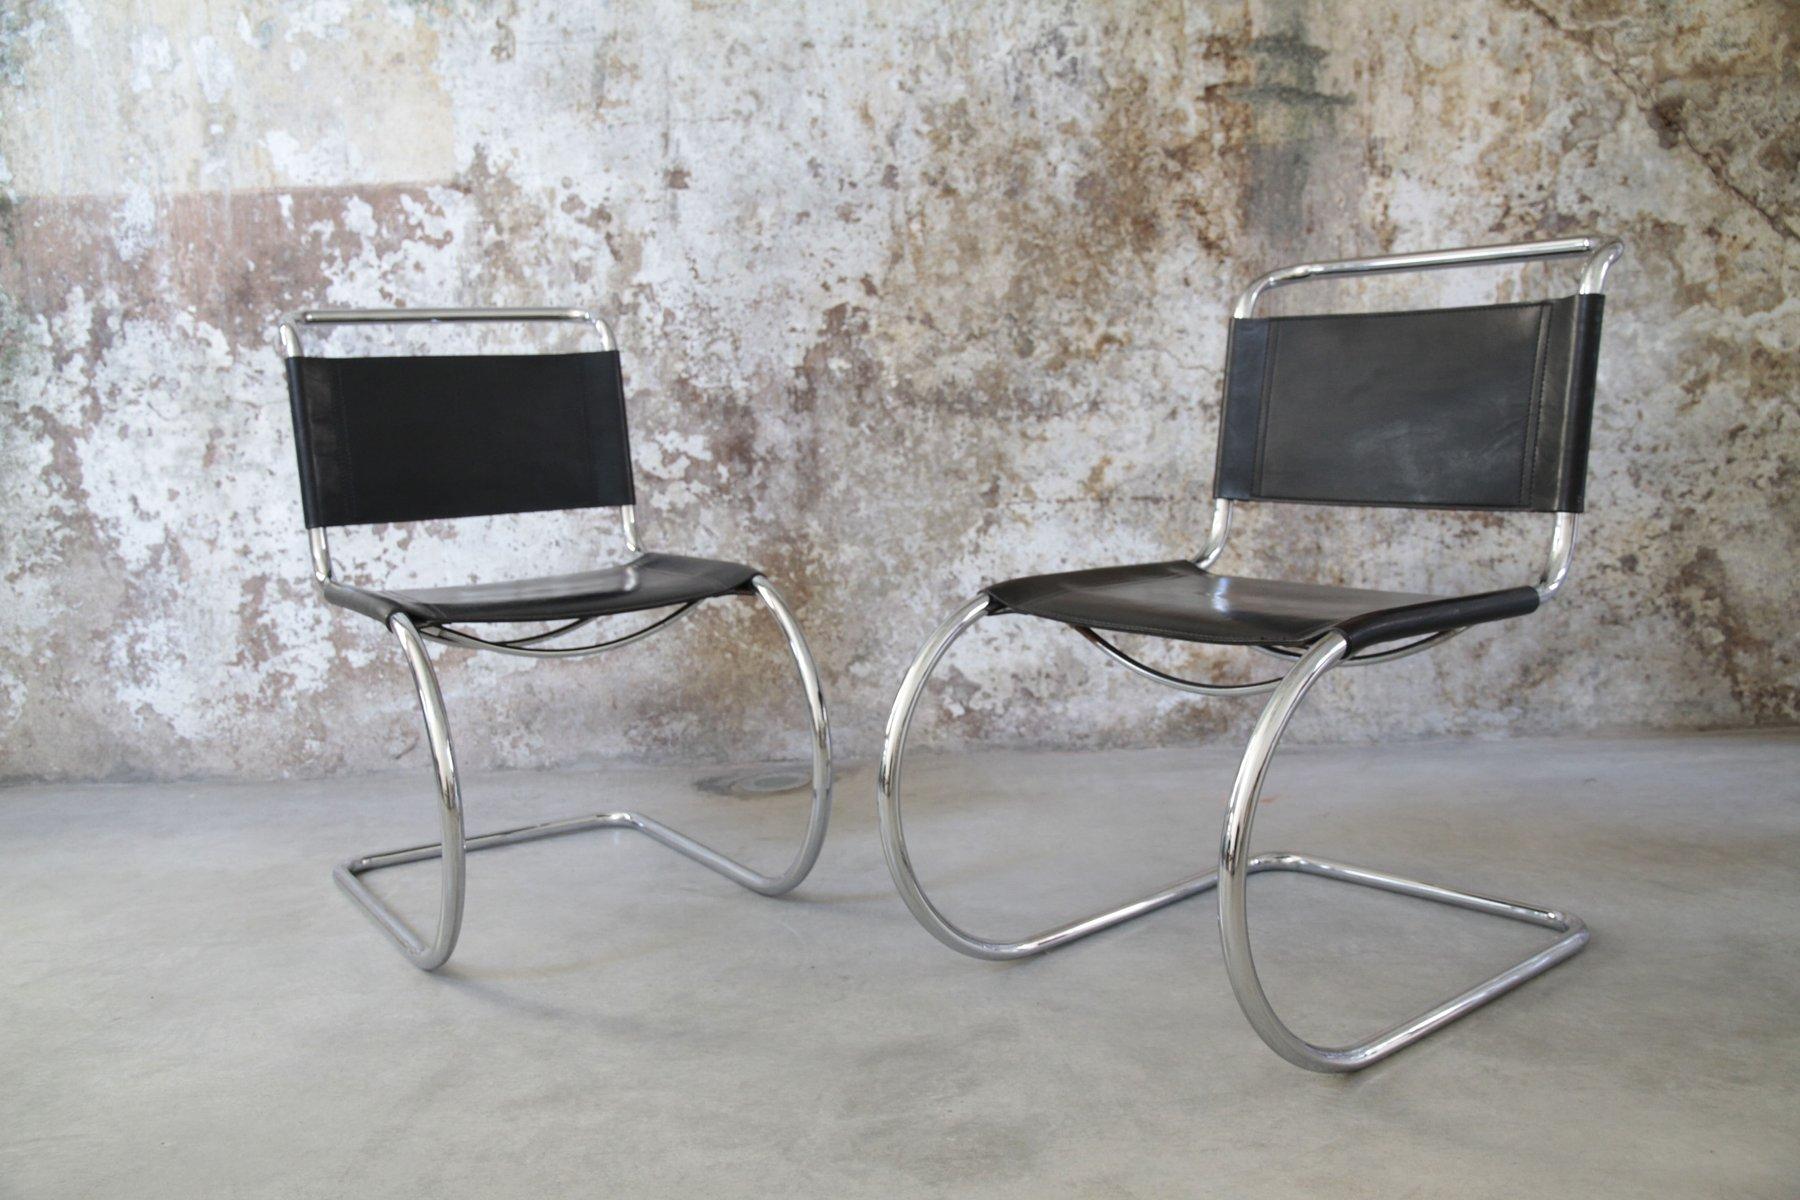 Vintage Steel Tubular Chairs by Ludwig Mies van der Rohe Set of 2